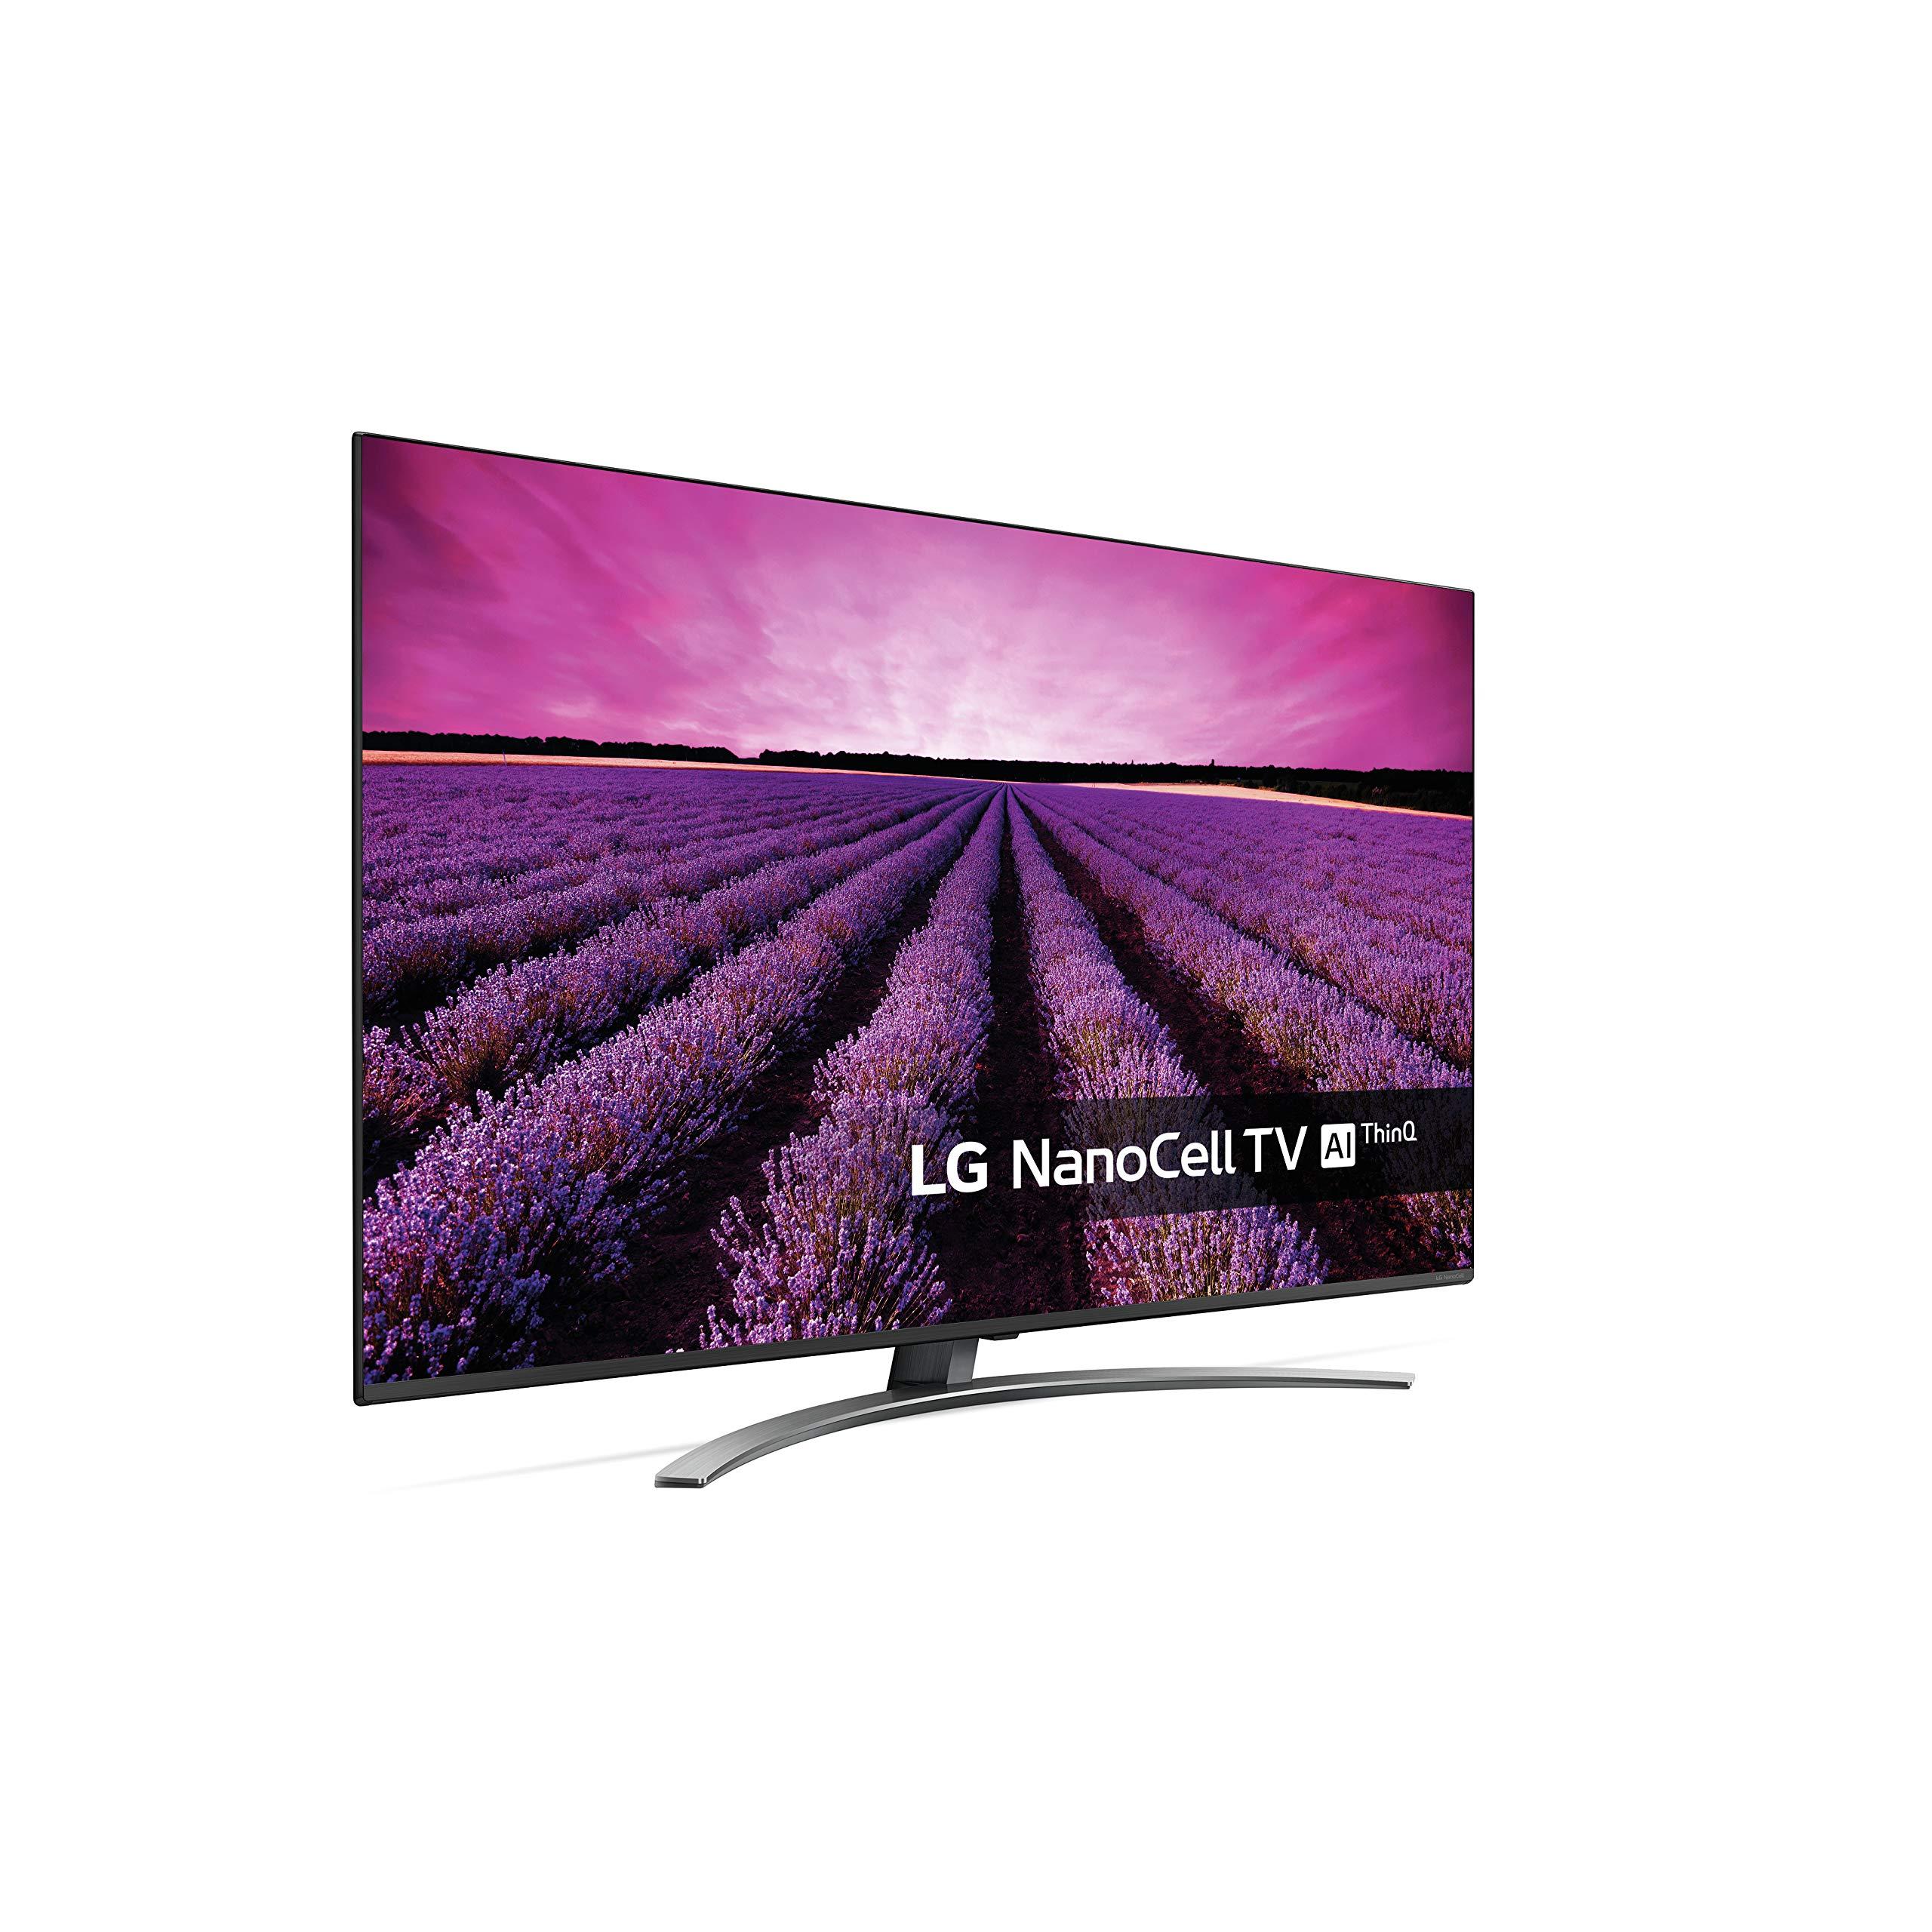 LG 55SM8200PLA TELEVISOR 55 4K UHD Smart TV IPS 2300HZ HDR 10PRO/H DVB-T2/C/S2: BLOCK: Amazon.es: Electrónica